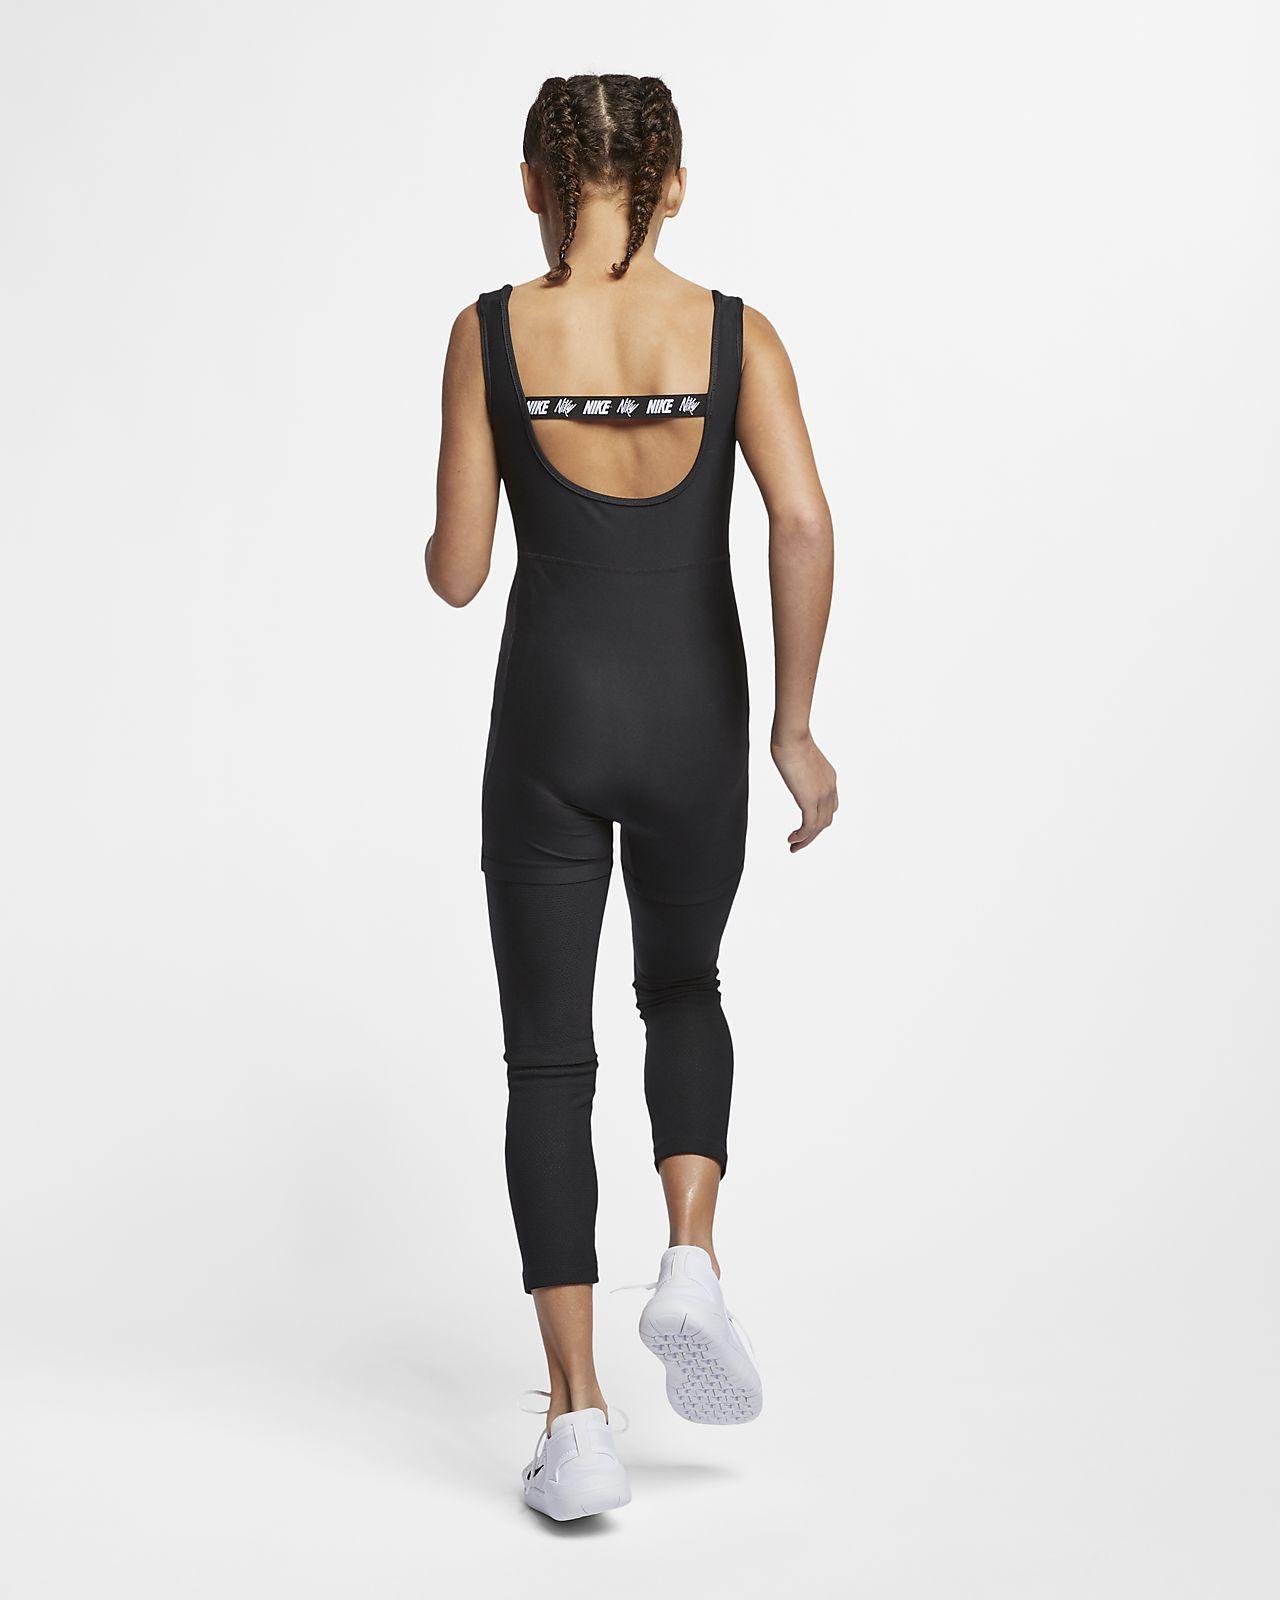 Nike Trainings-Bodysuit für ältere Kinder (Mädchen)